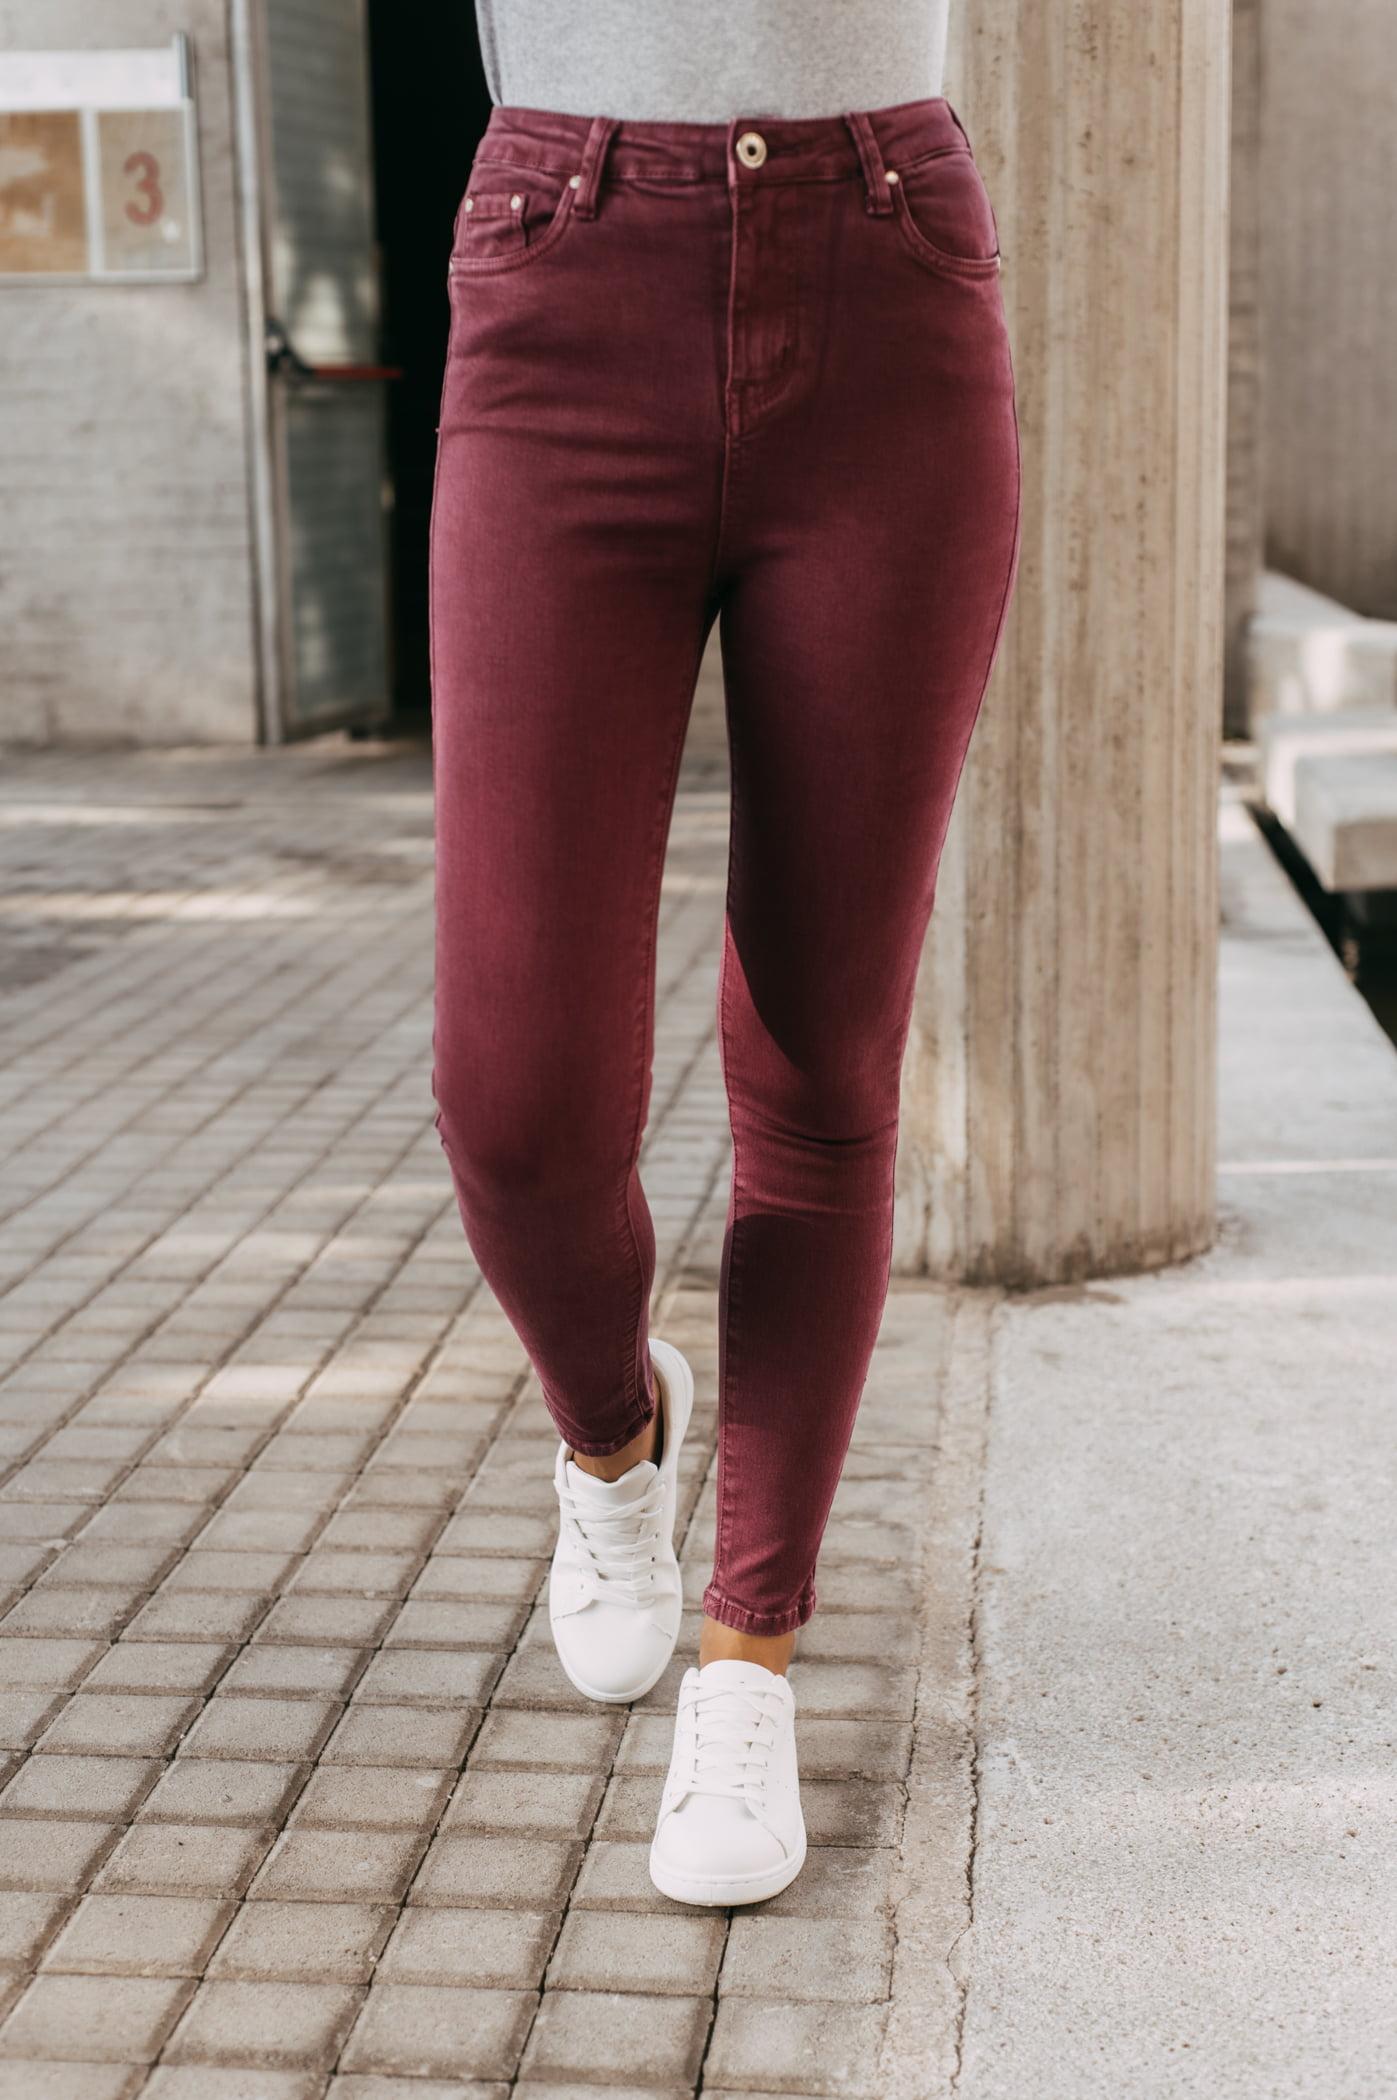 antithesis-clothing-jean-panteloni-mpornto (8)